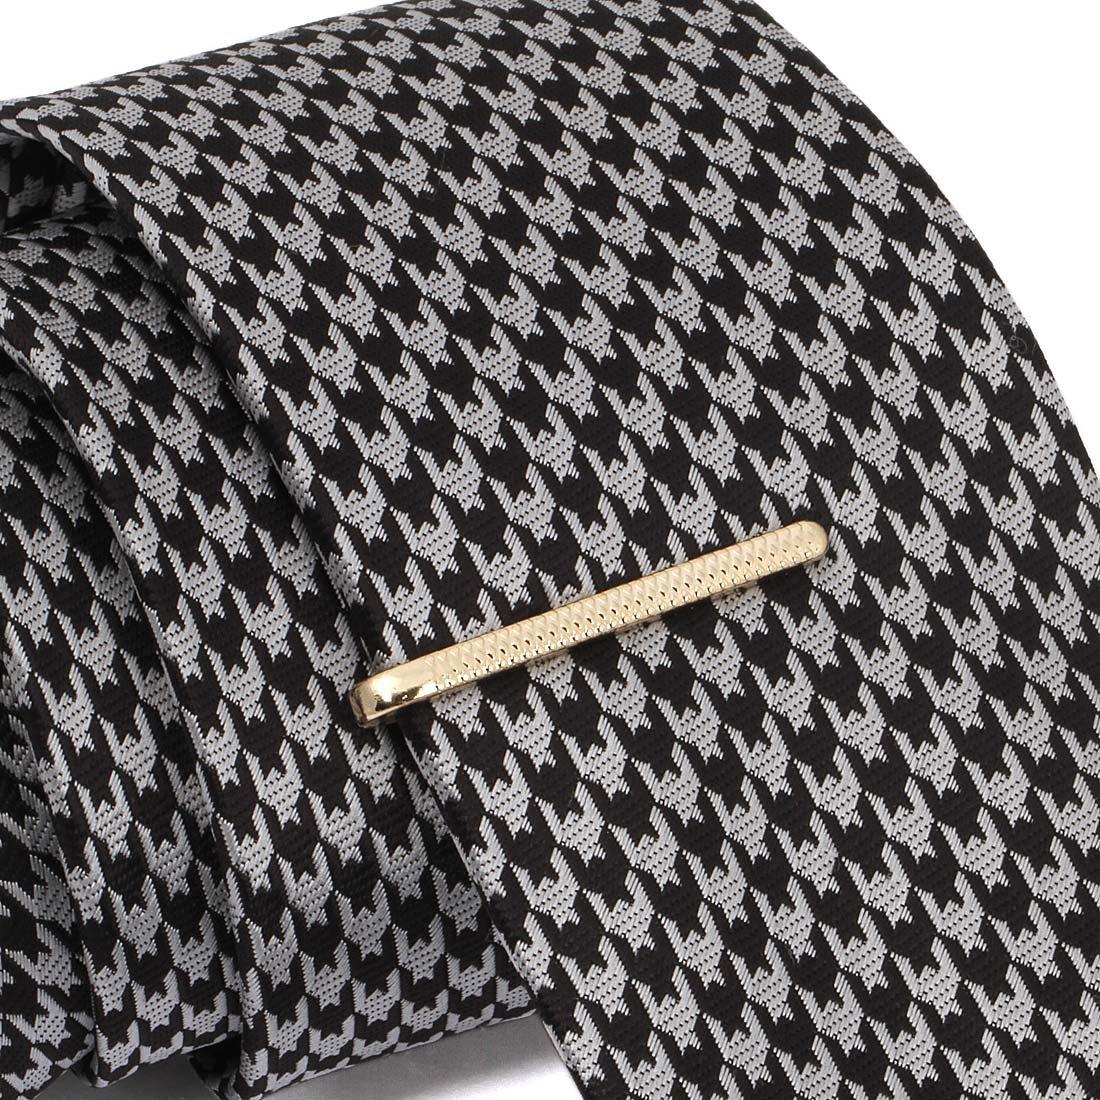 BMC 8pc Stylish Ultra Thin Mixed Metal Finish Bobby Pin Styled Tie Bar Set by b.m.c (Image #6)